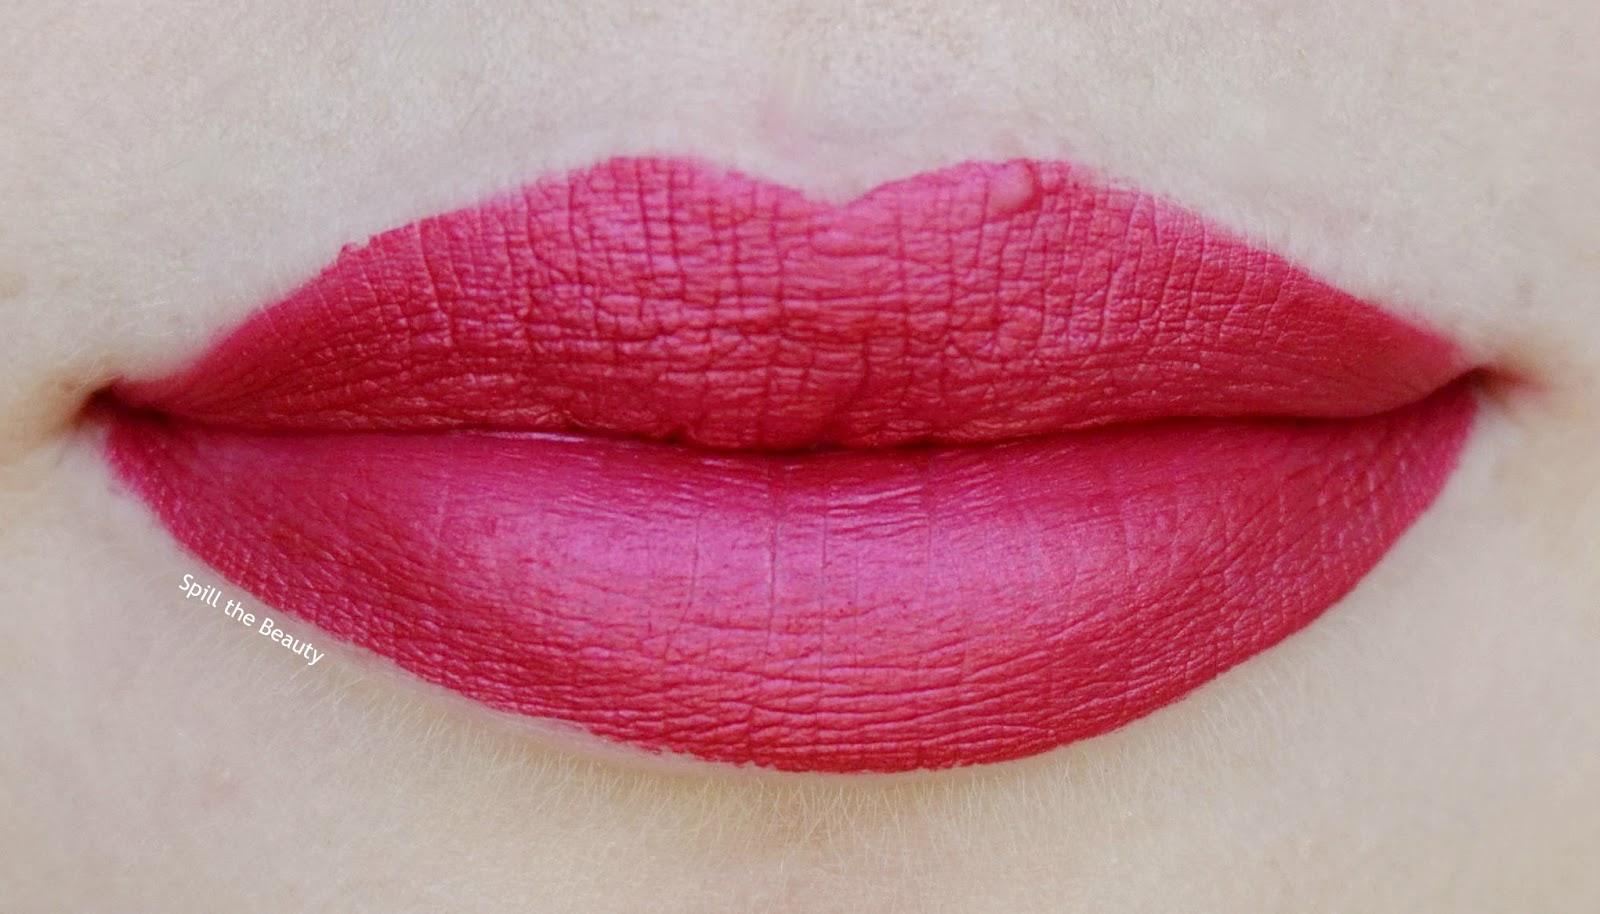 milani amore mattalic lip creme 06 mattely in love lips